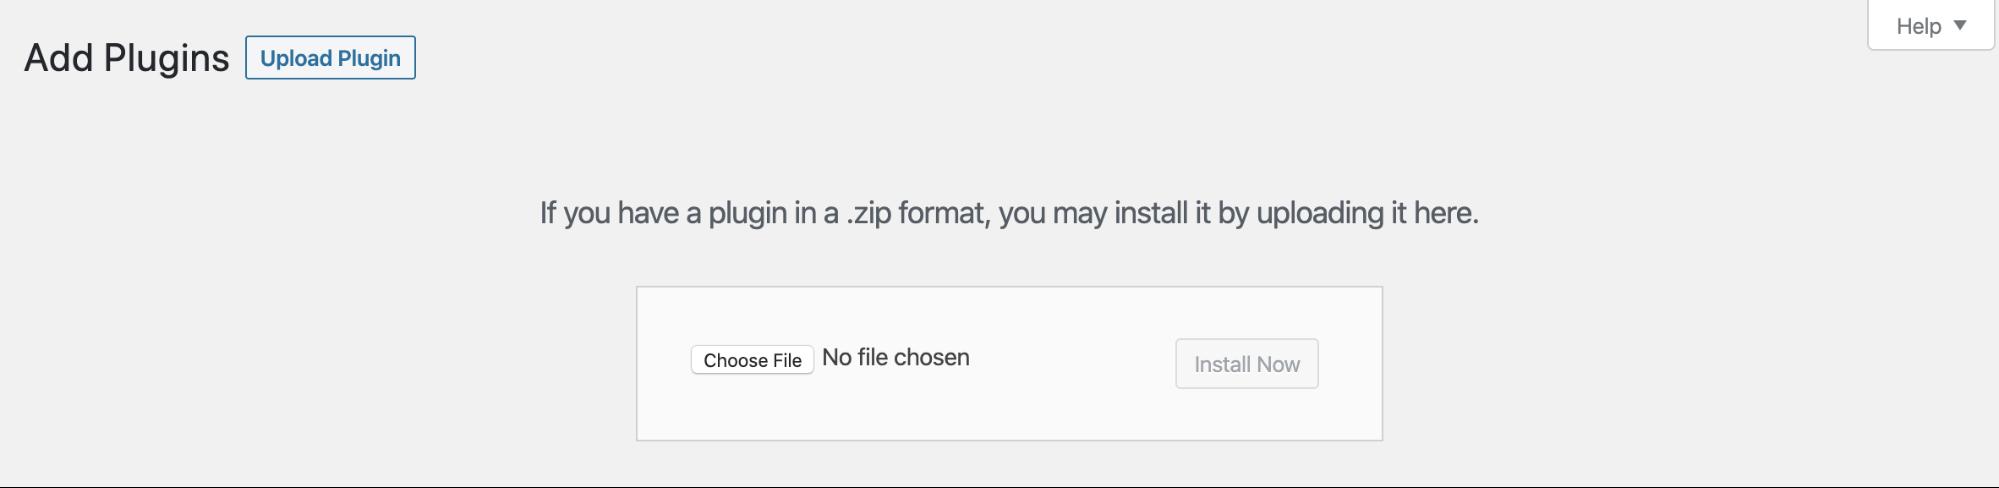 wordpress add plugins section menu